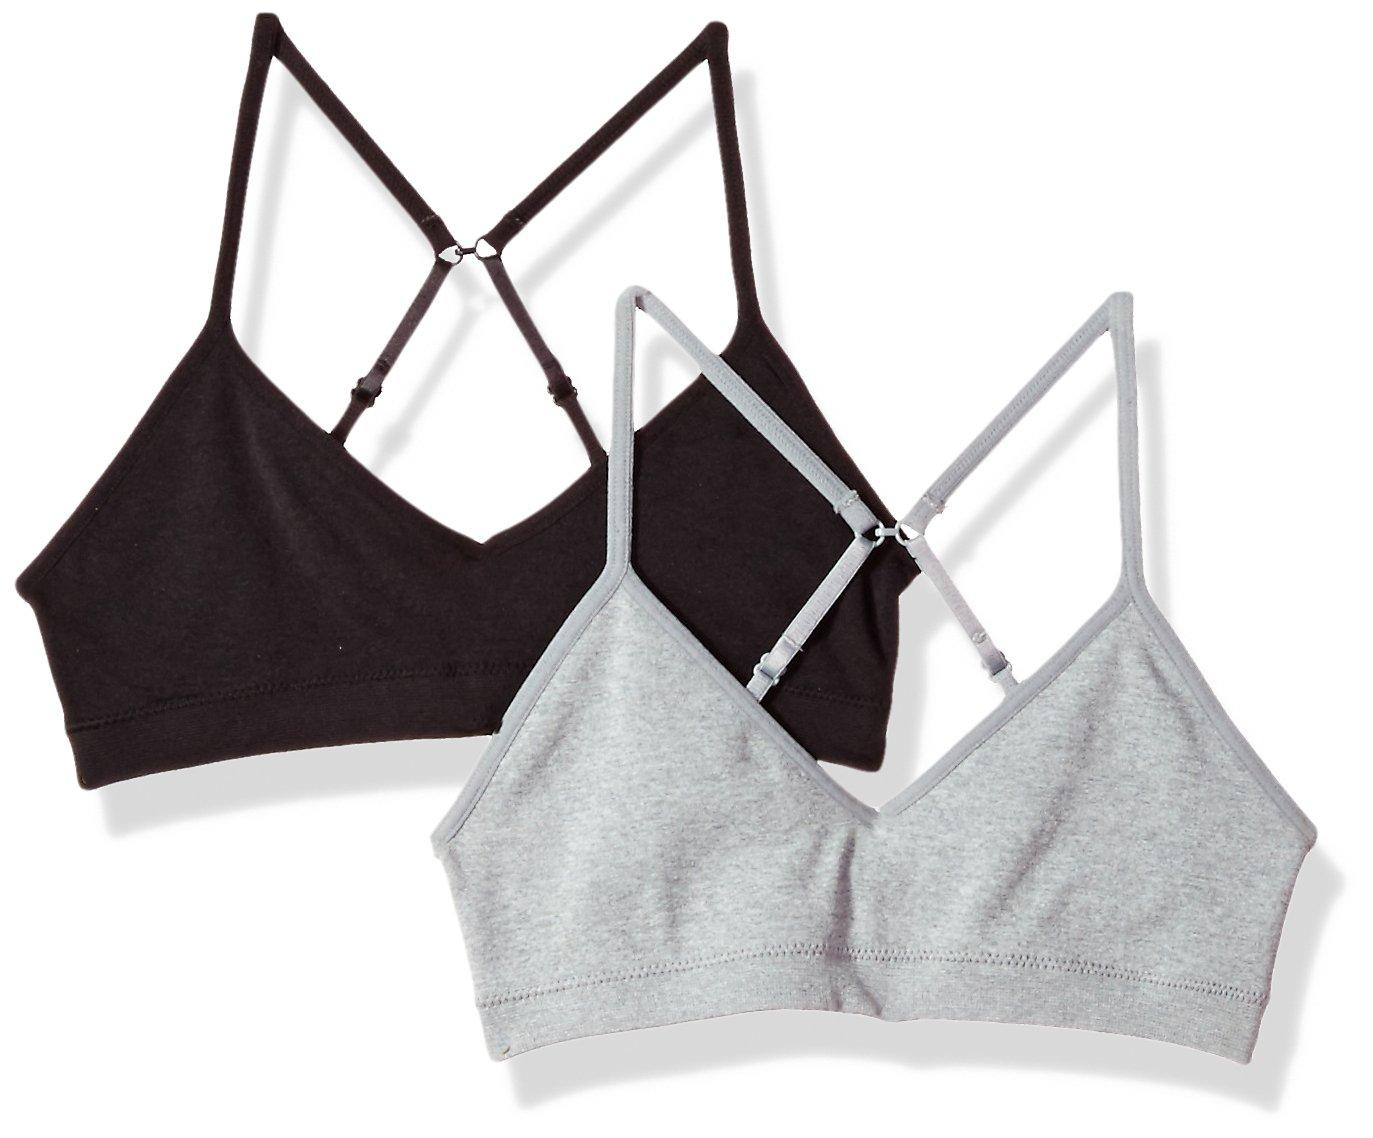 Hanes Big Girls' ComfortFlex Seamless Bralette 2-Pack, Black/Heather Grey, Medium